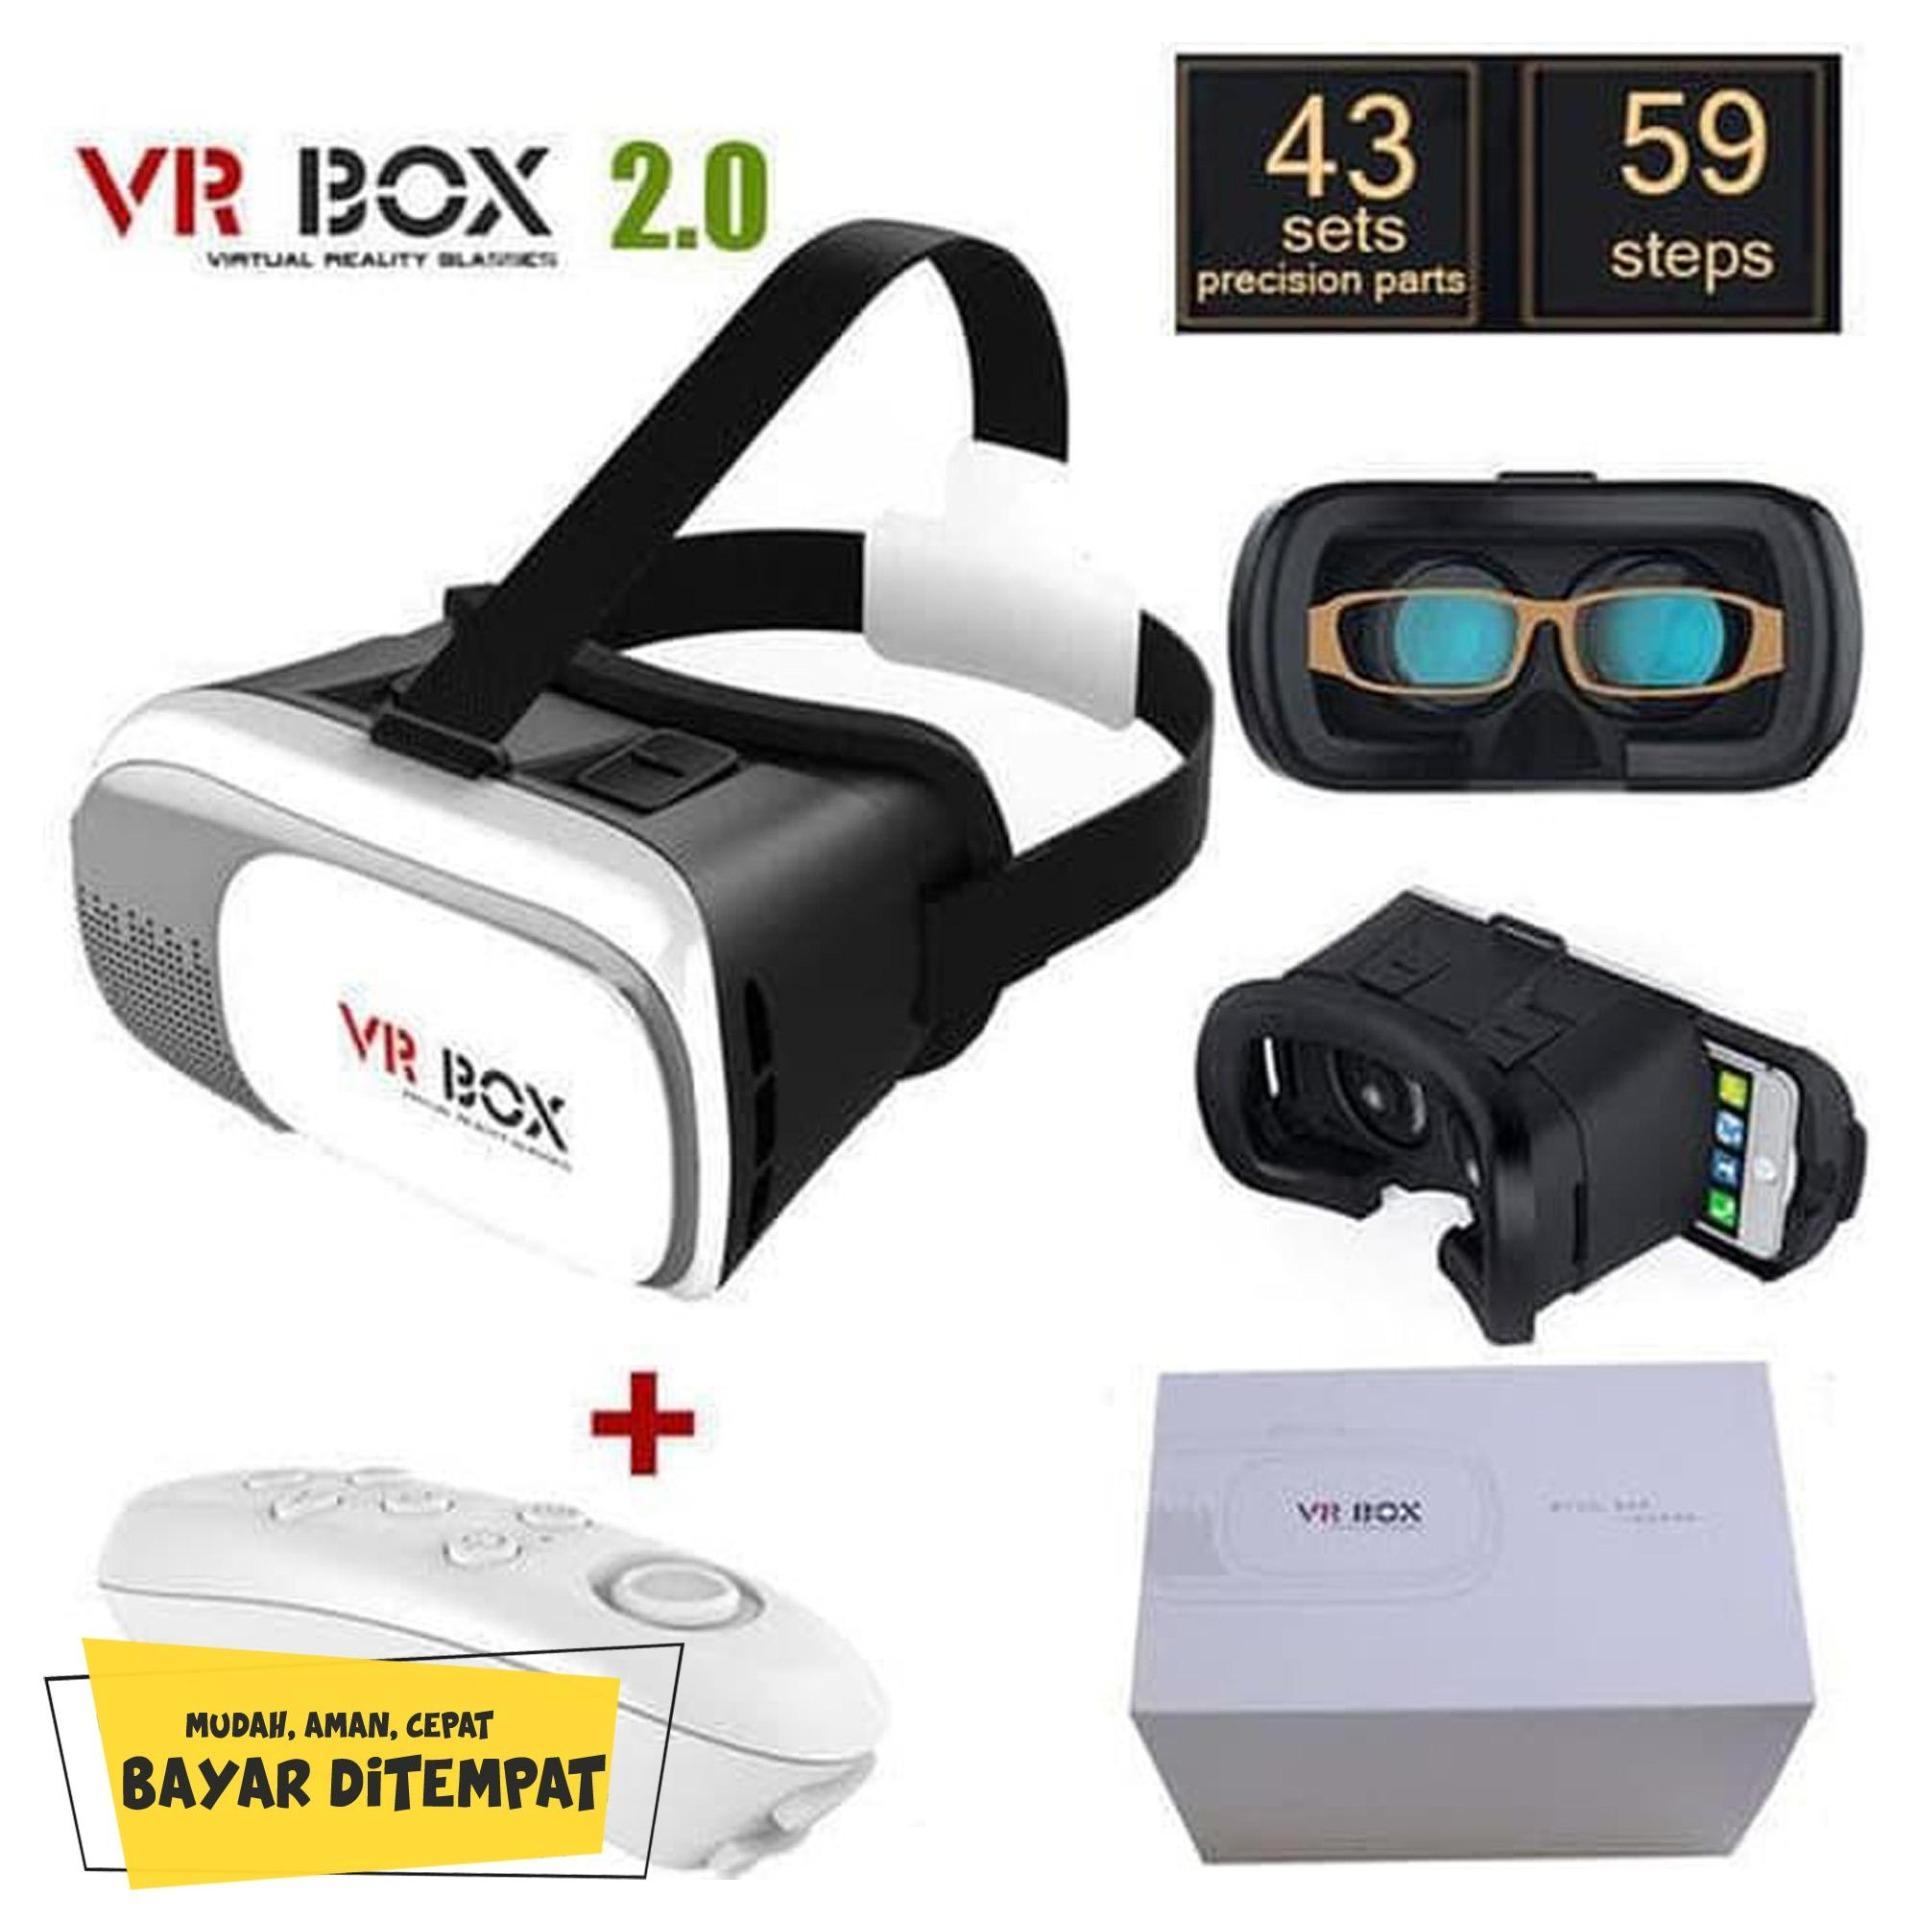 paket vr box 2.0 + bluetooth gamepad ( virtual reality glasses ) | vr box joystick | 1 set vr box untuk hp | vr vivo | stik game vr